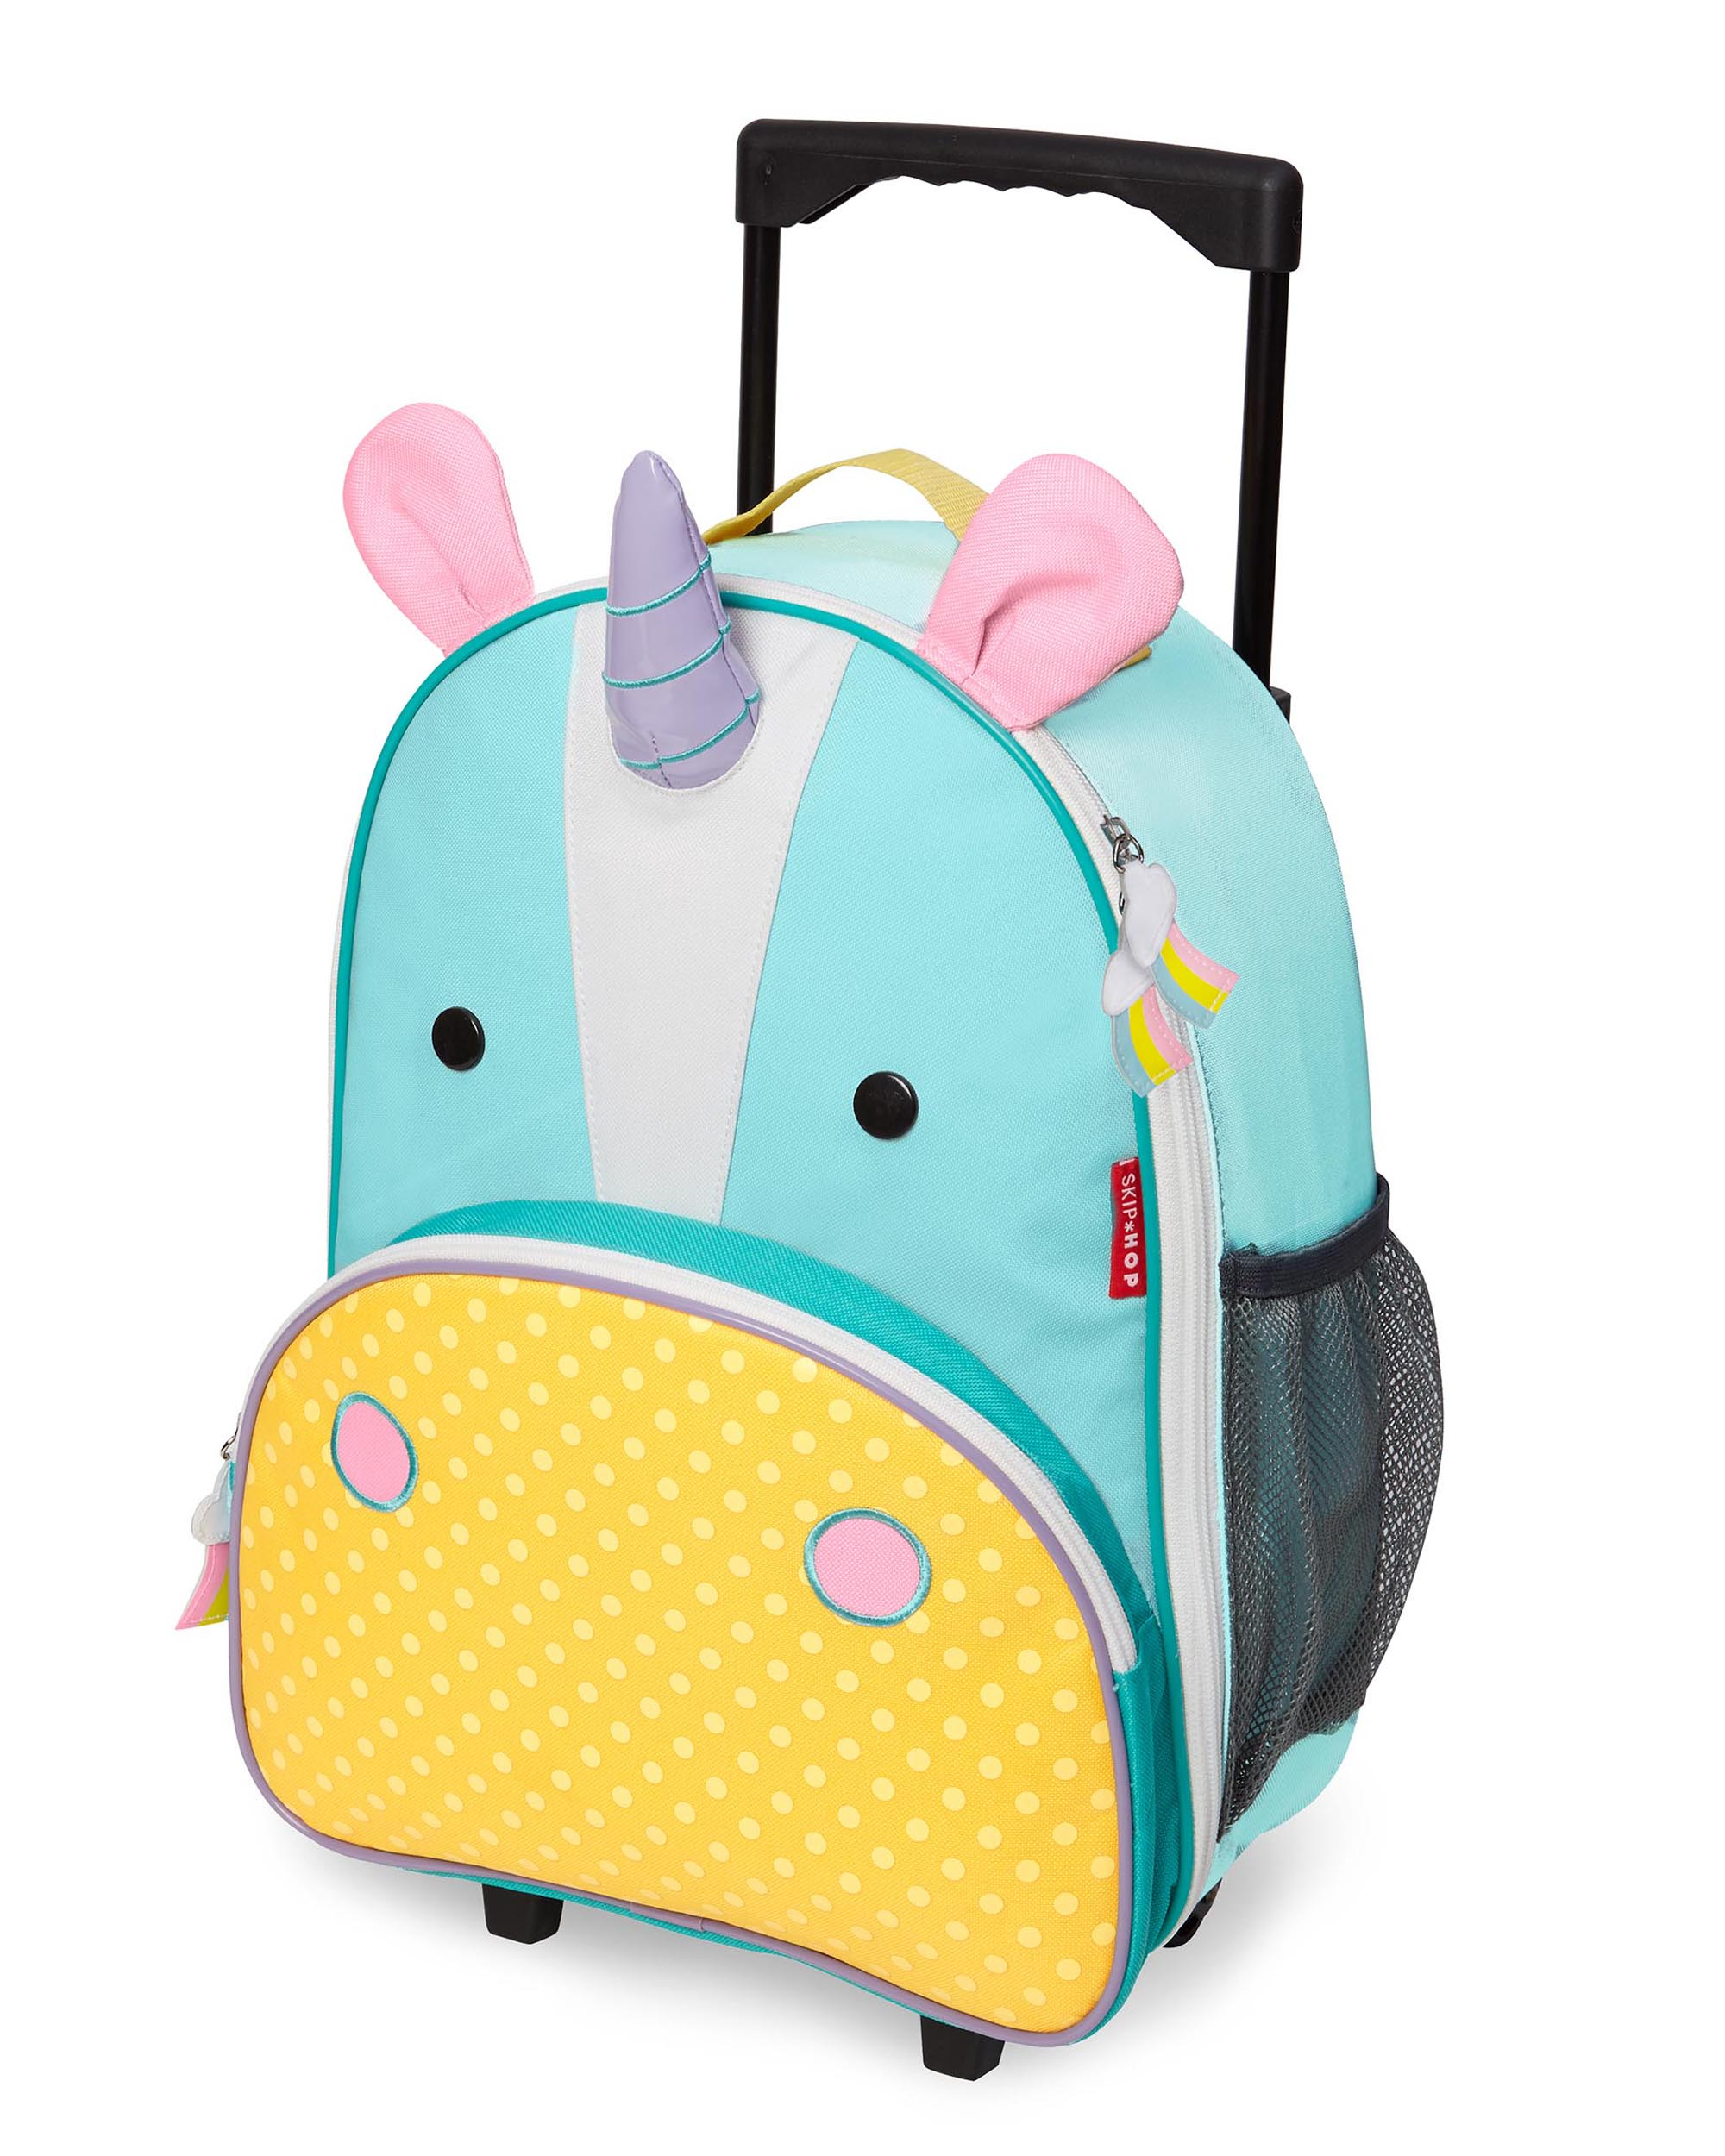 36f62e9d415a Zoo kids rolling luggage | skiphop.com